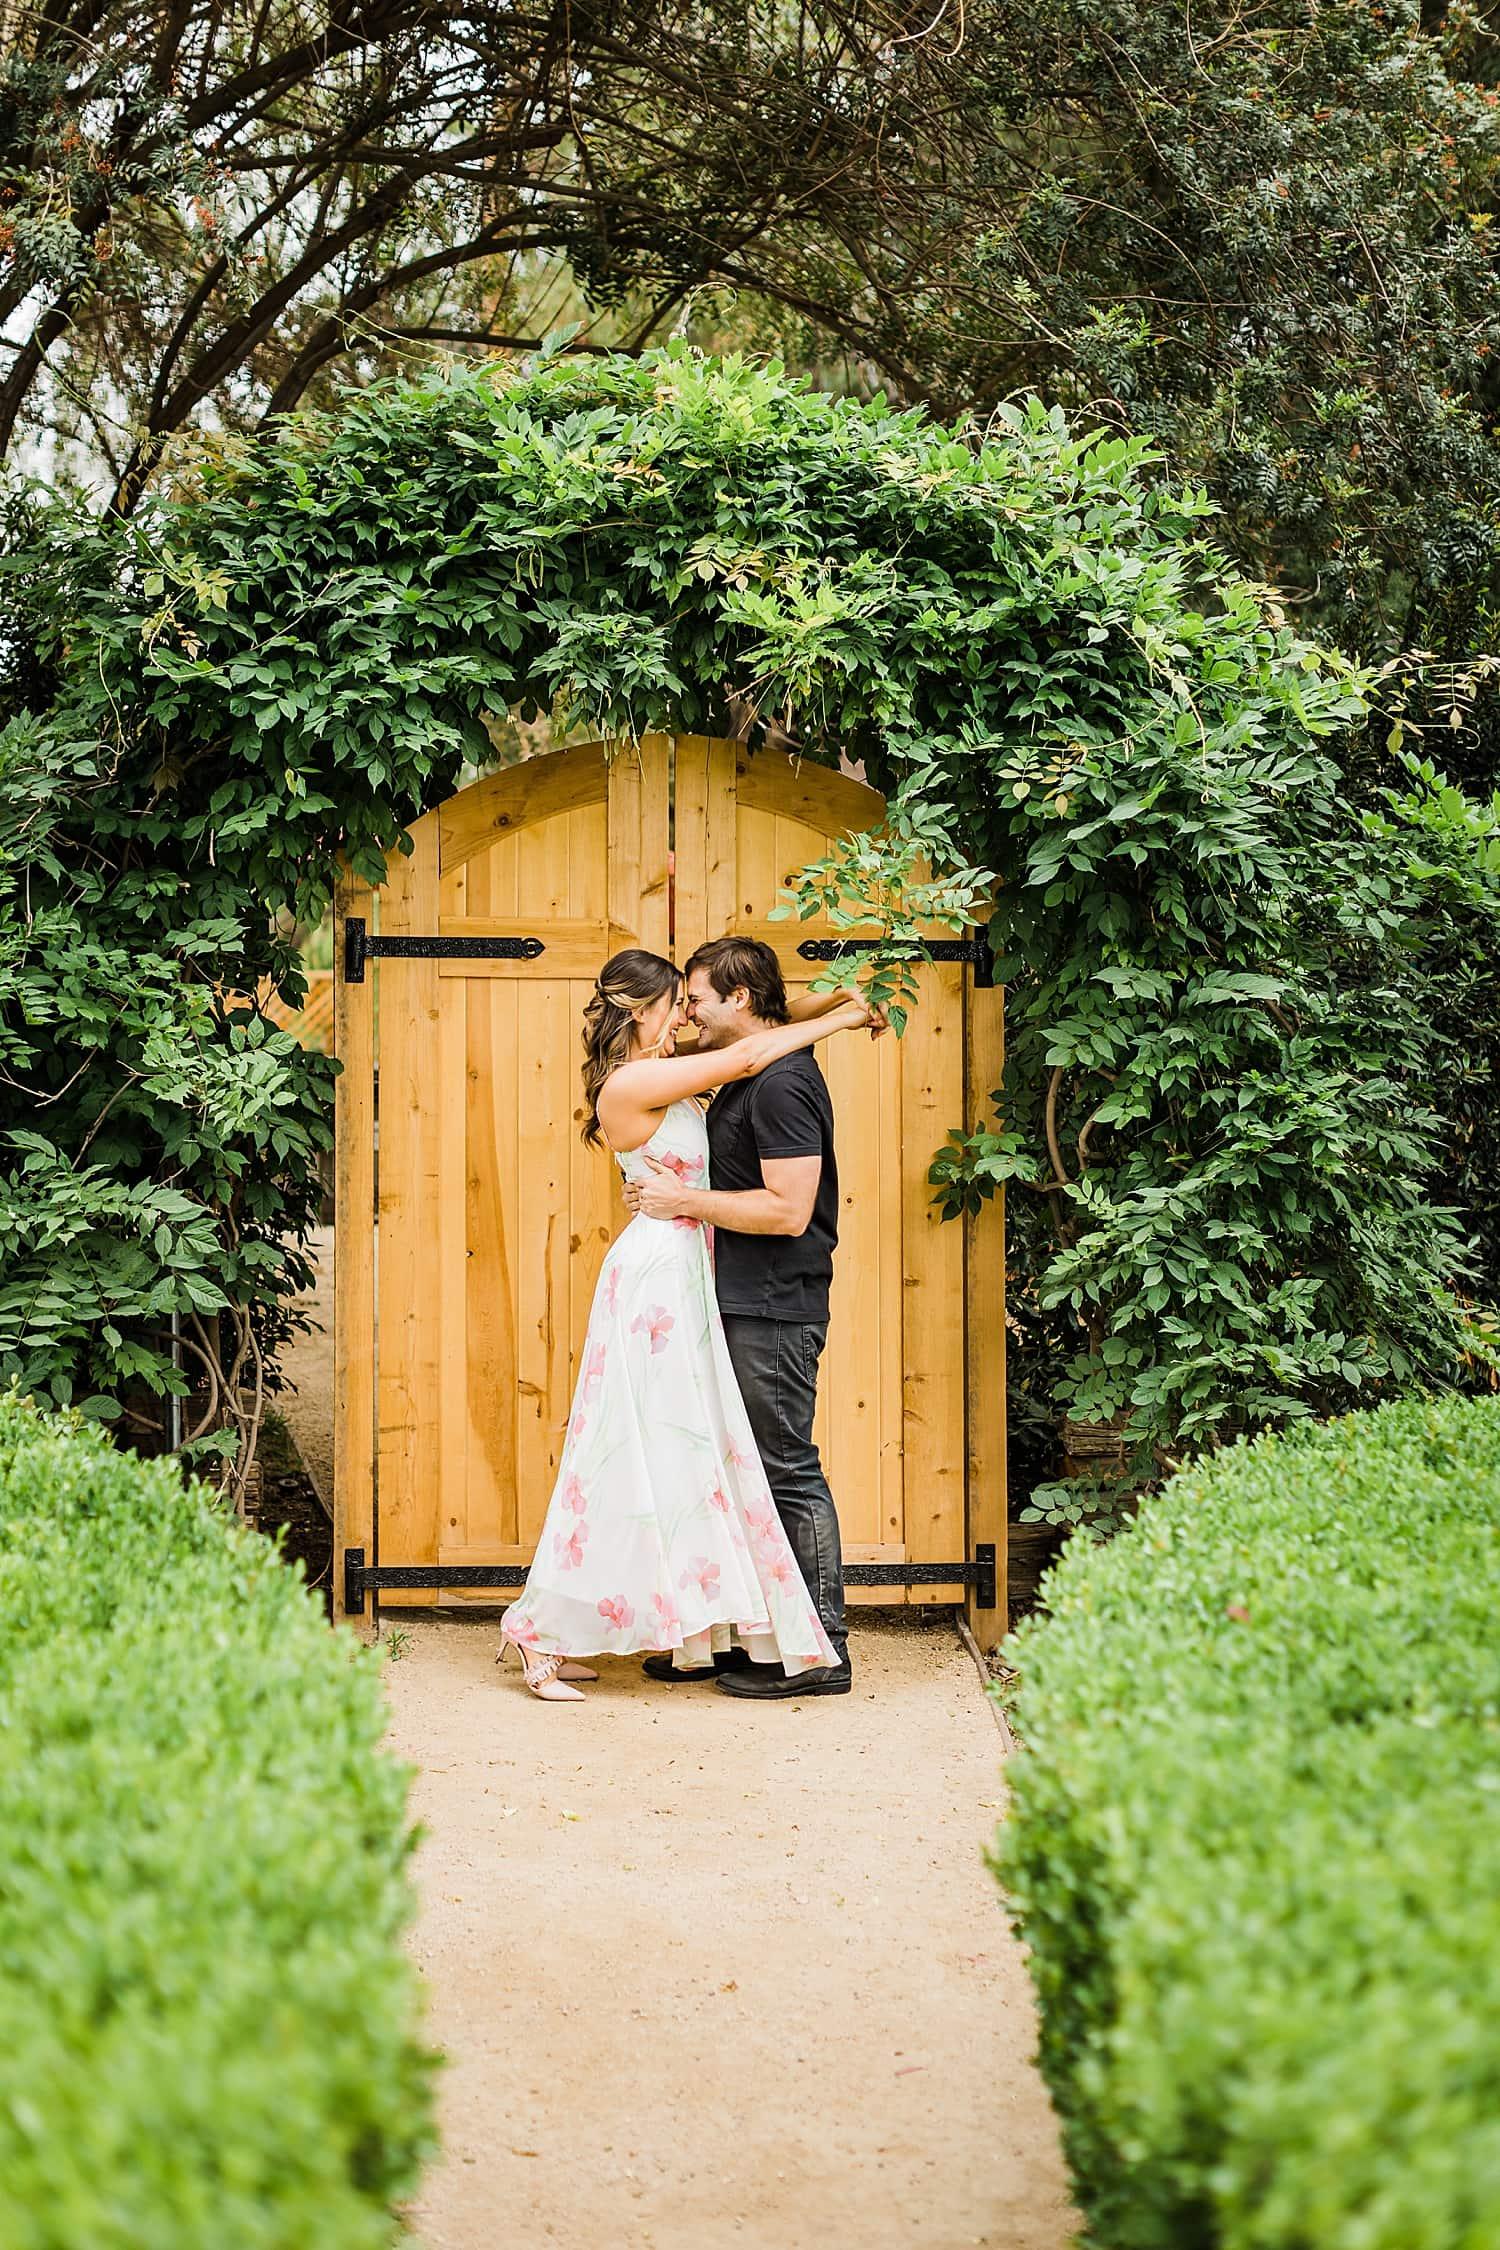 Lake-Oak-Meadows-Engagement-Anniversary-wedding-temecula-wedding-photographer-vitagliano-vineyards-winery-engagement-wedding